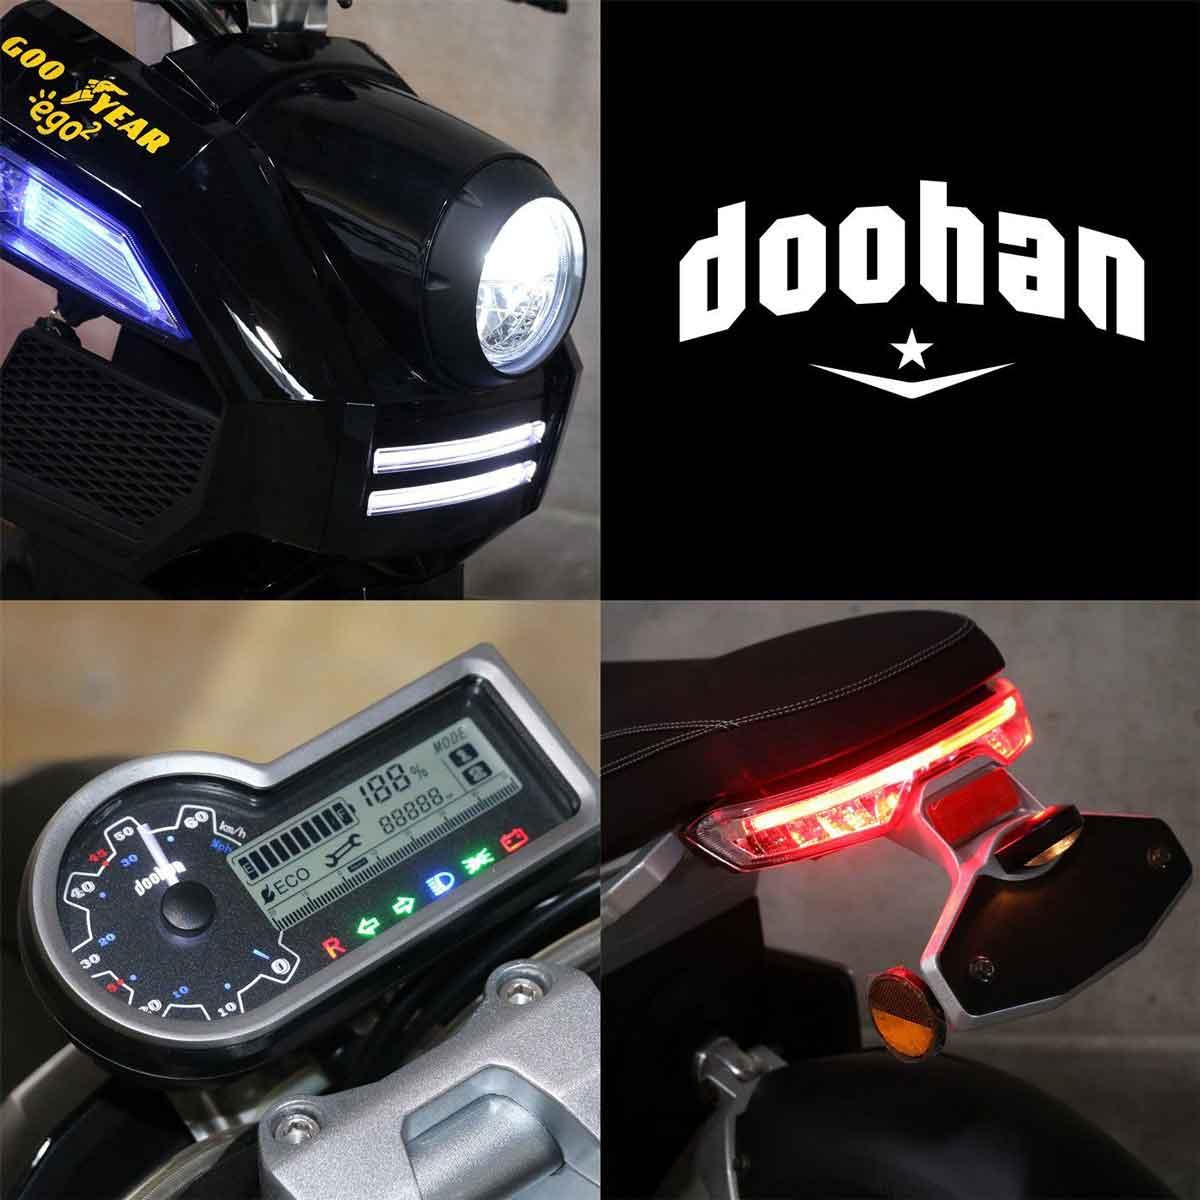 Elektroroller 3 Rad Dohhan i Tank Goodyaer Ego 2 Bild 4